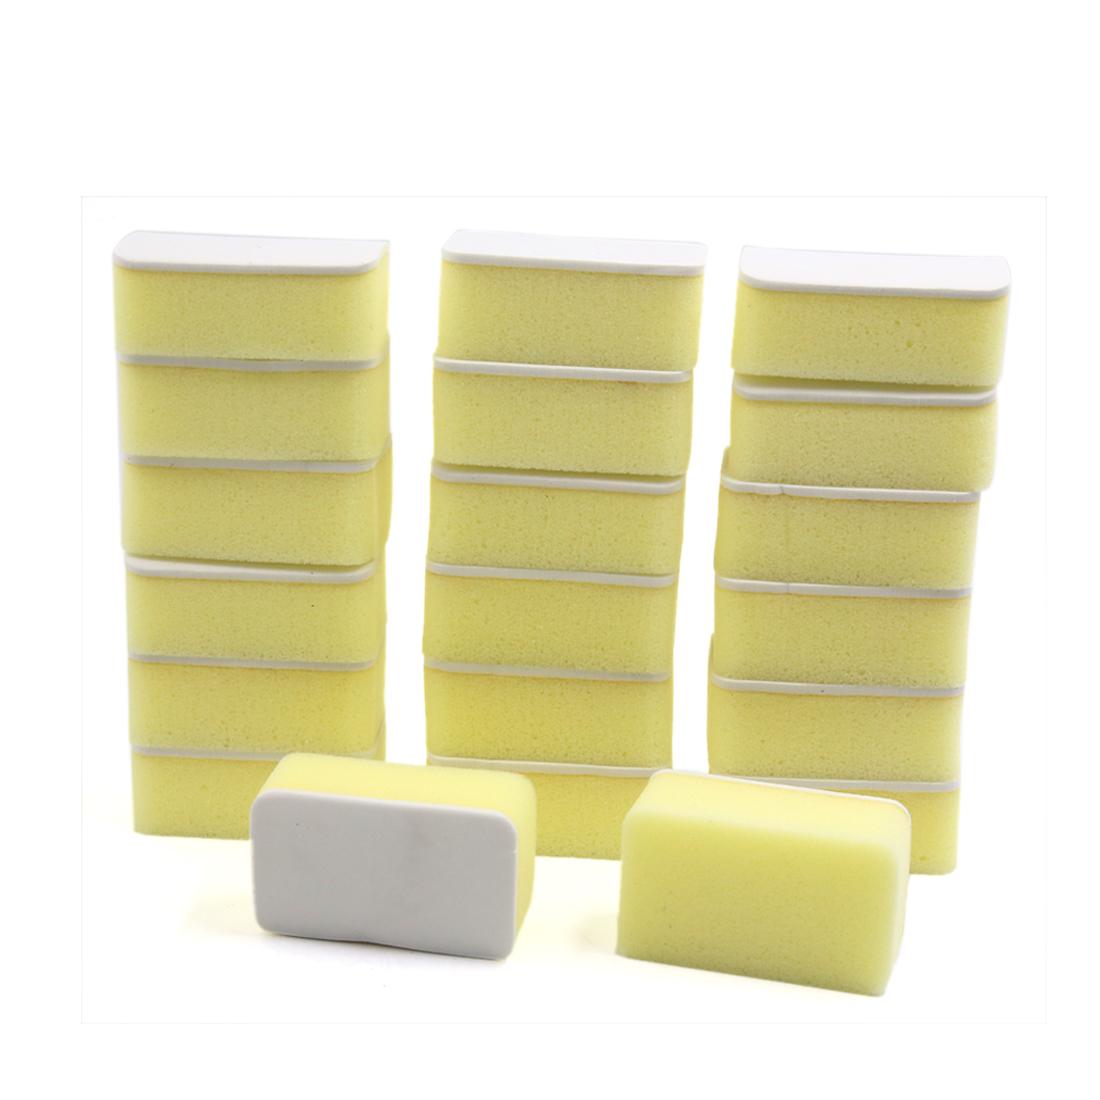 20Pcs Yellow Rectangle Suction Sponge Block Washing Pad Auto Cleaning Tool